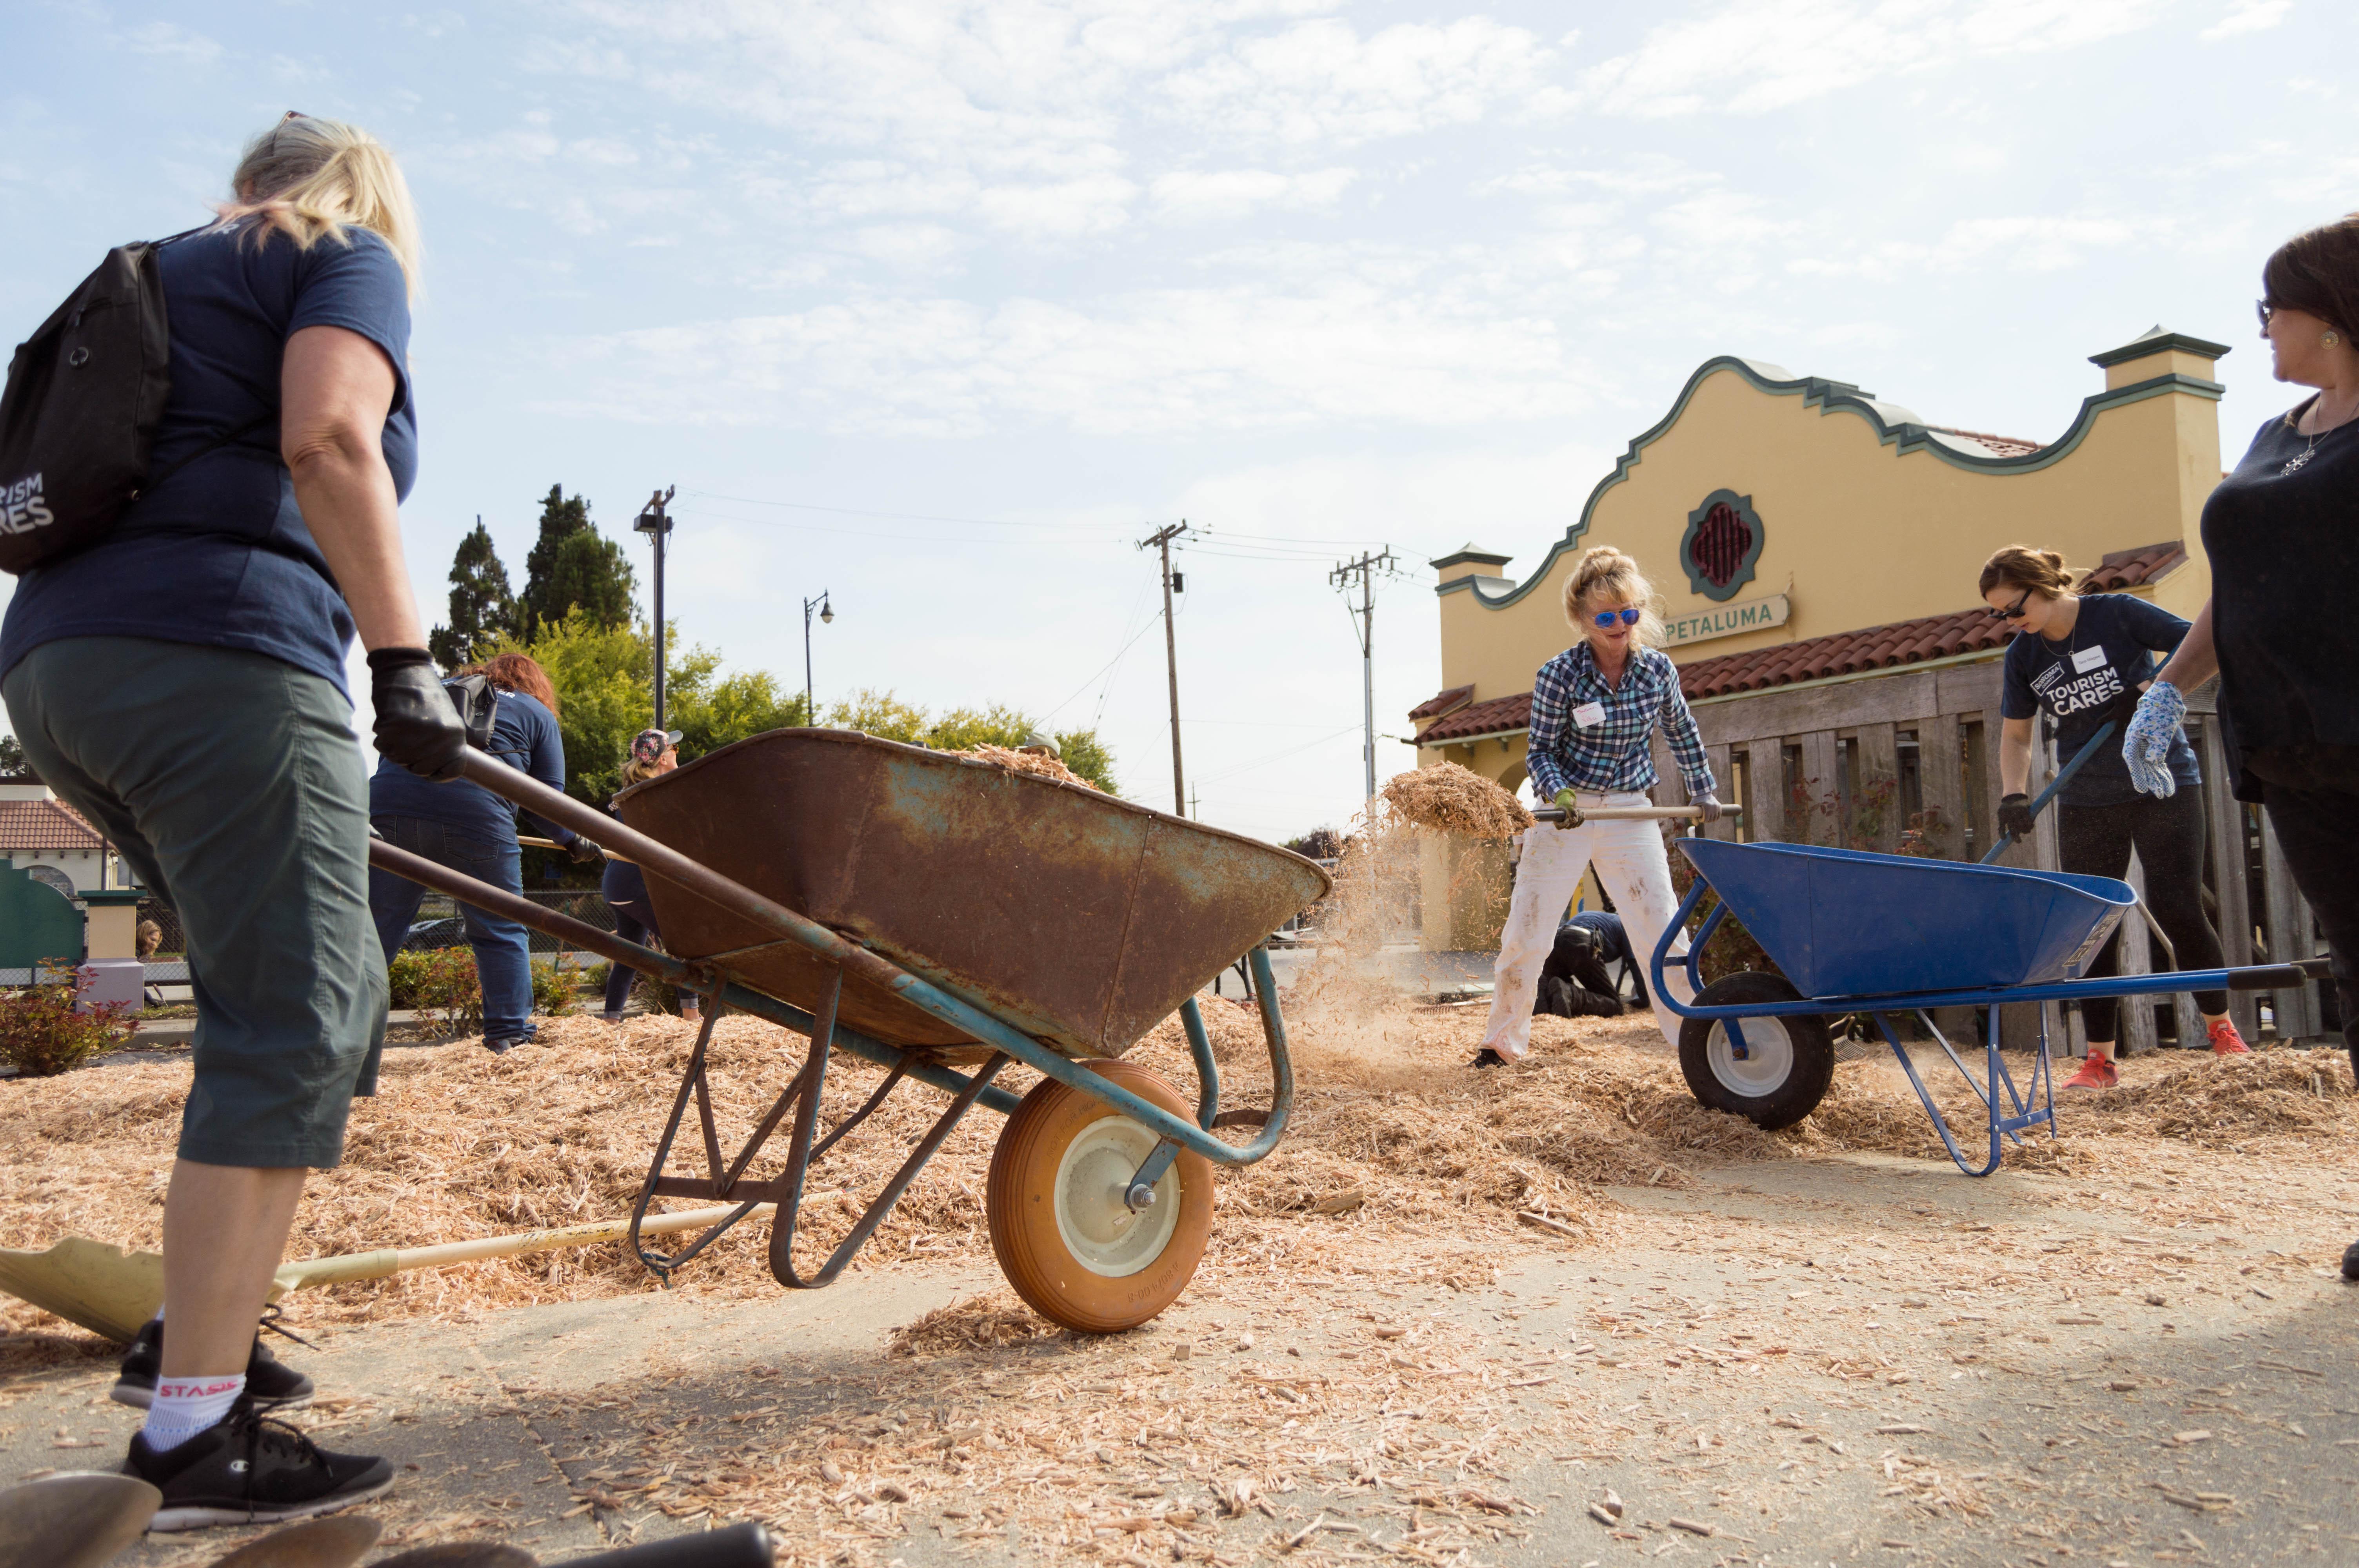 Volunteers work to beautify the Petaluma Visitors Center in Sonoma County, California